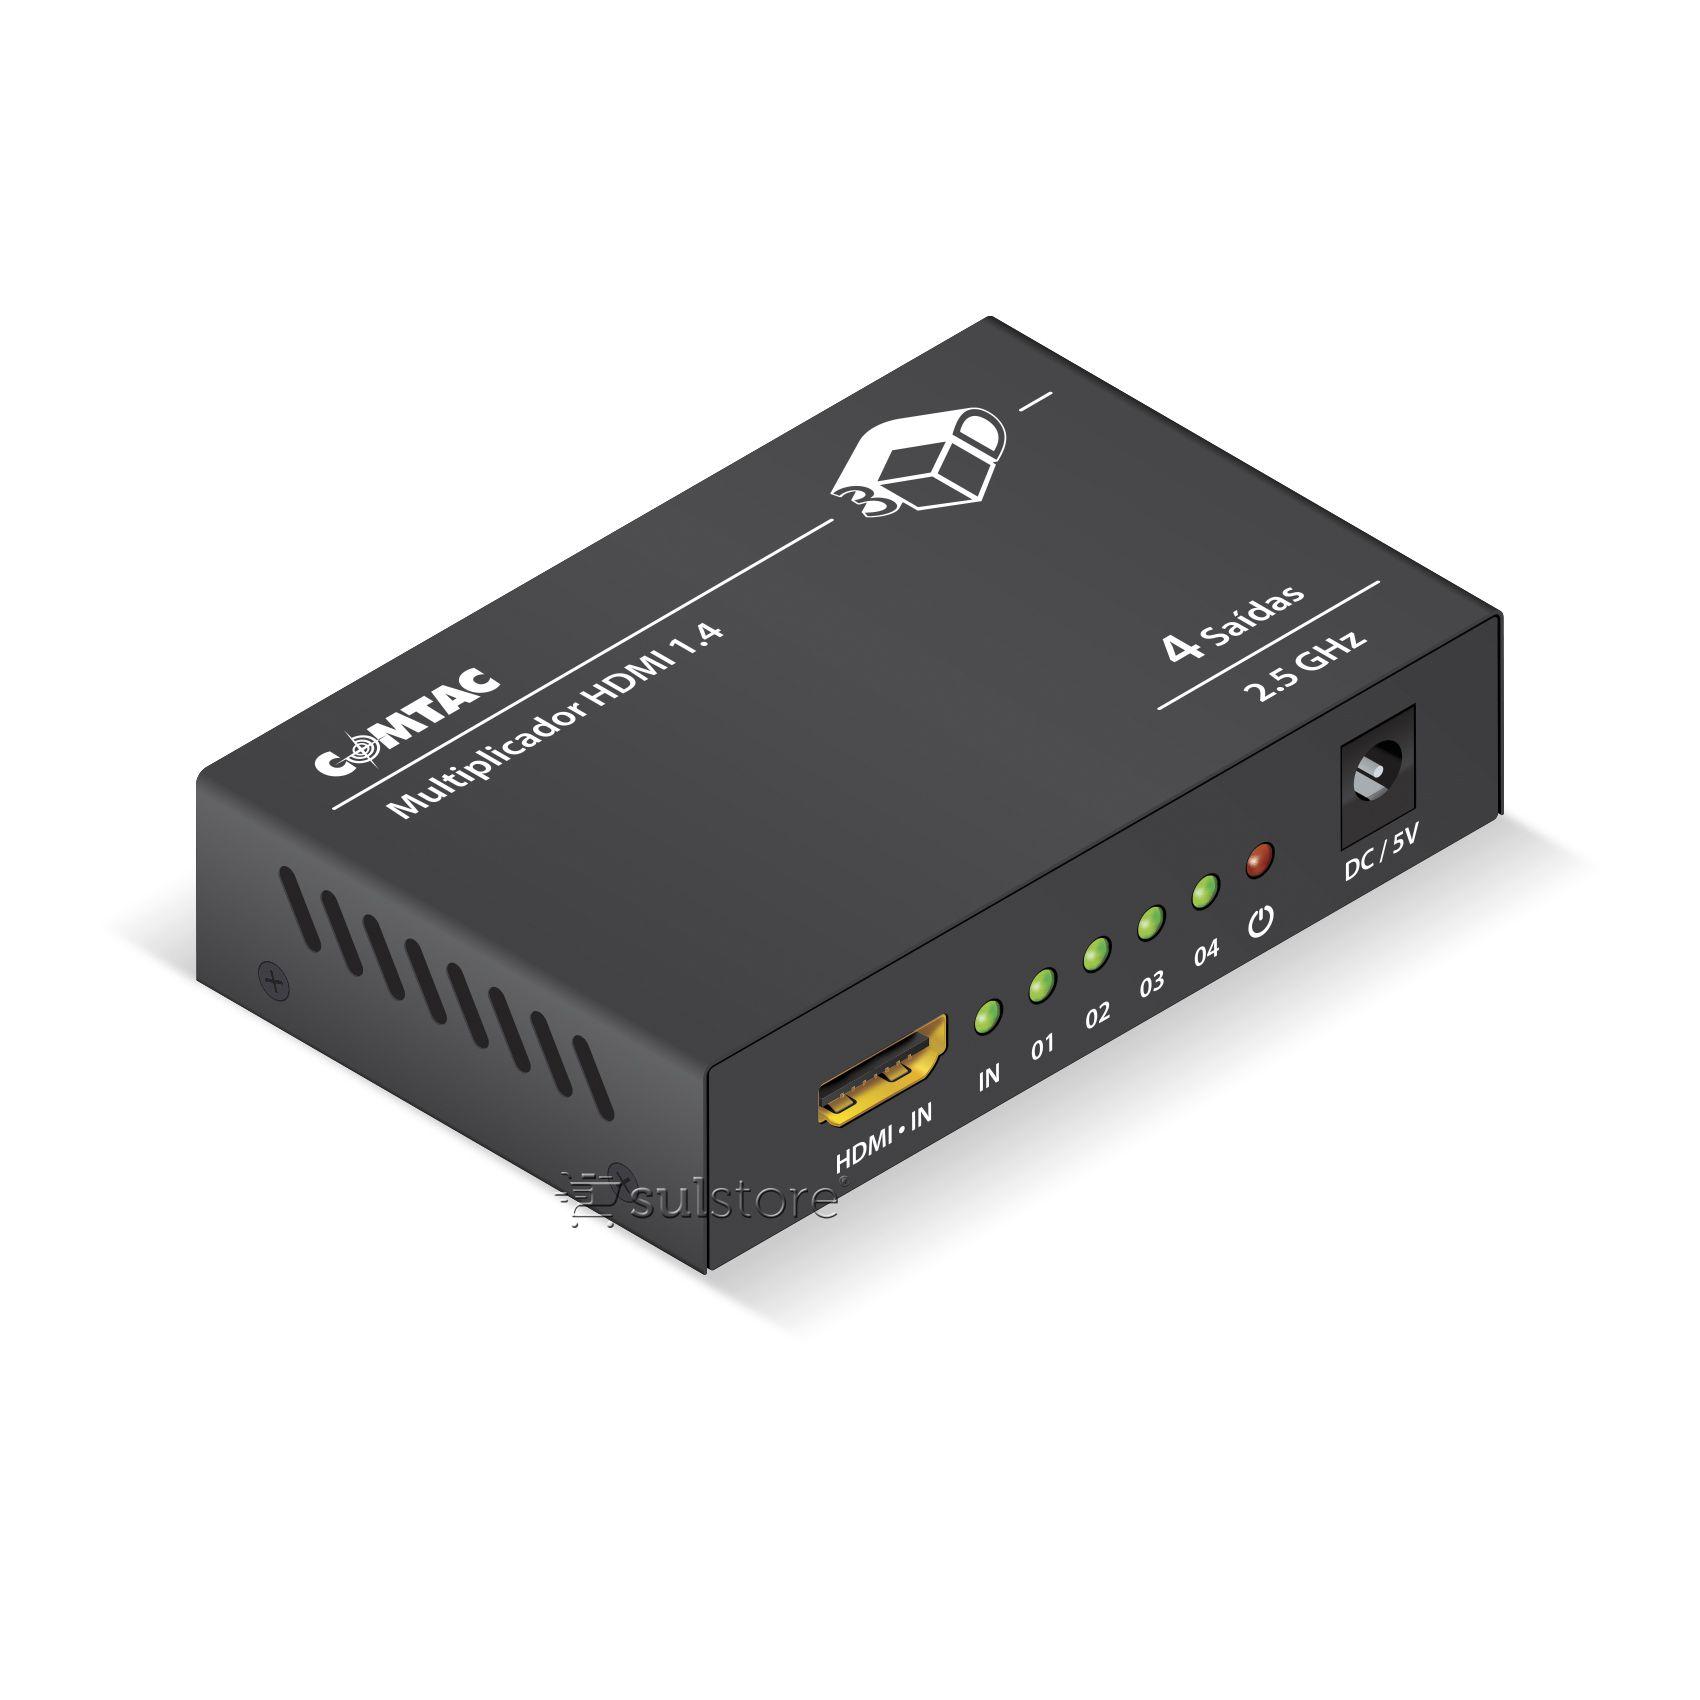 Multiplicador HDMI 1 Entrada e 4 Saídas Splitter Switch Comtac 9286